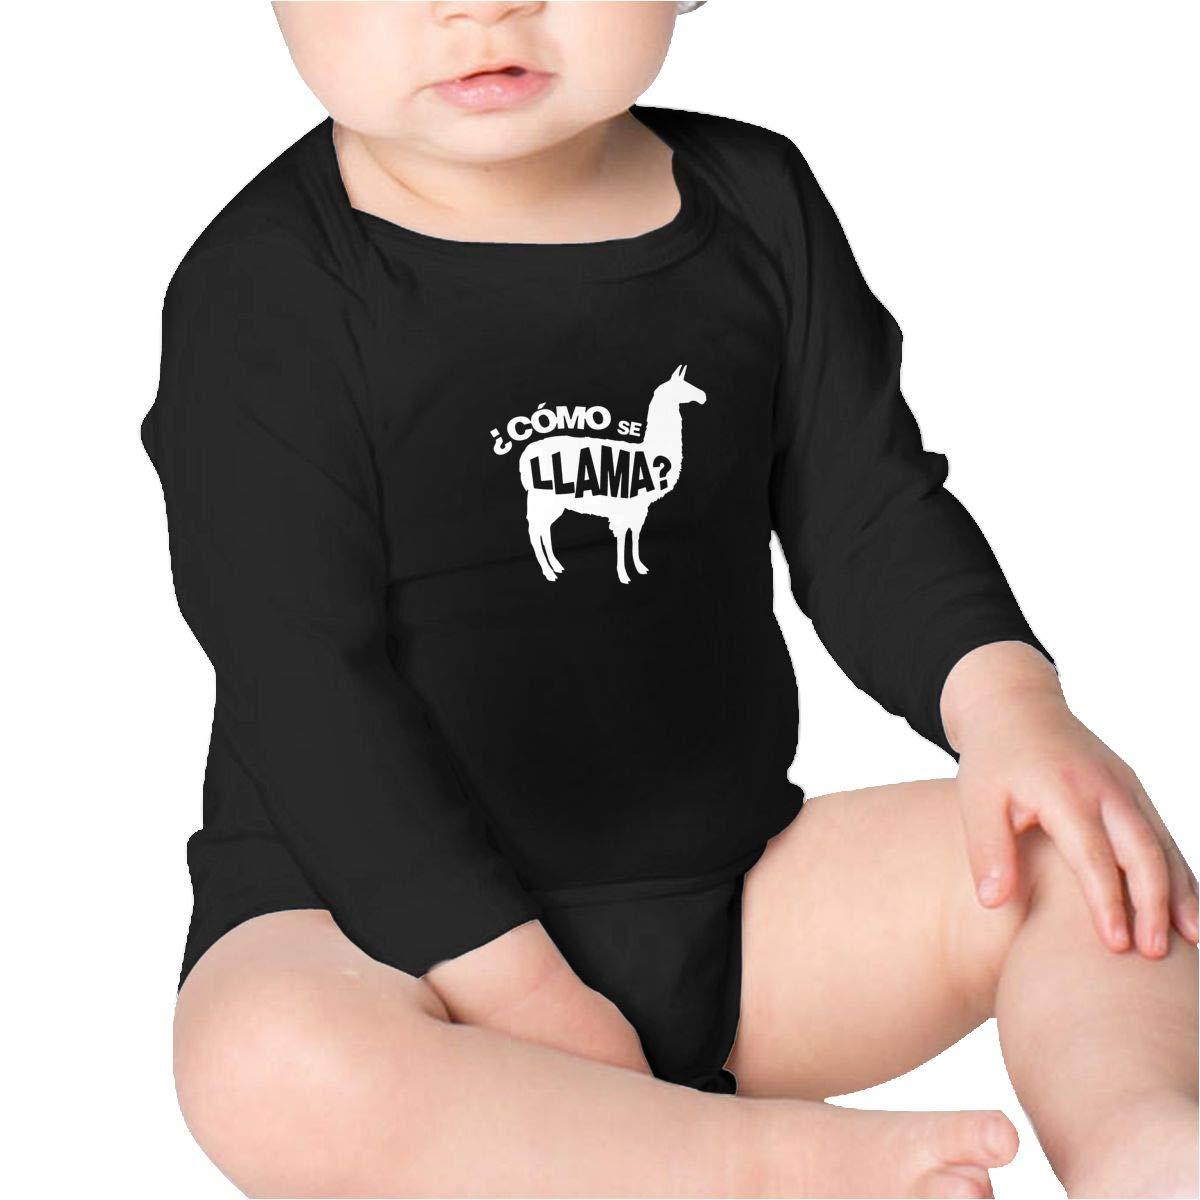 Como Se Llama Pun Funny Humor Joke Baby Cotton,Long Sleeve Baby Romper